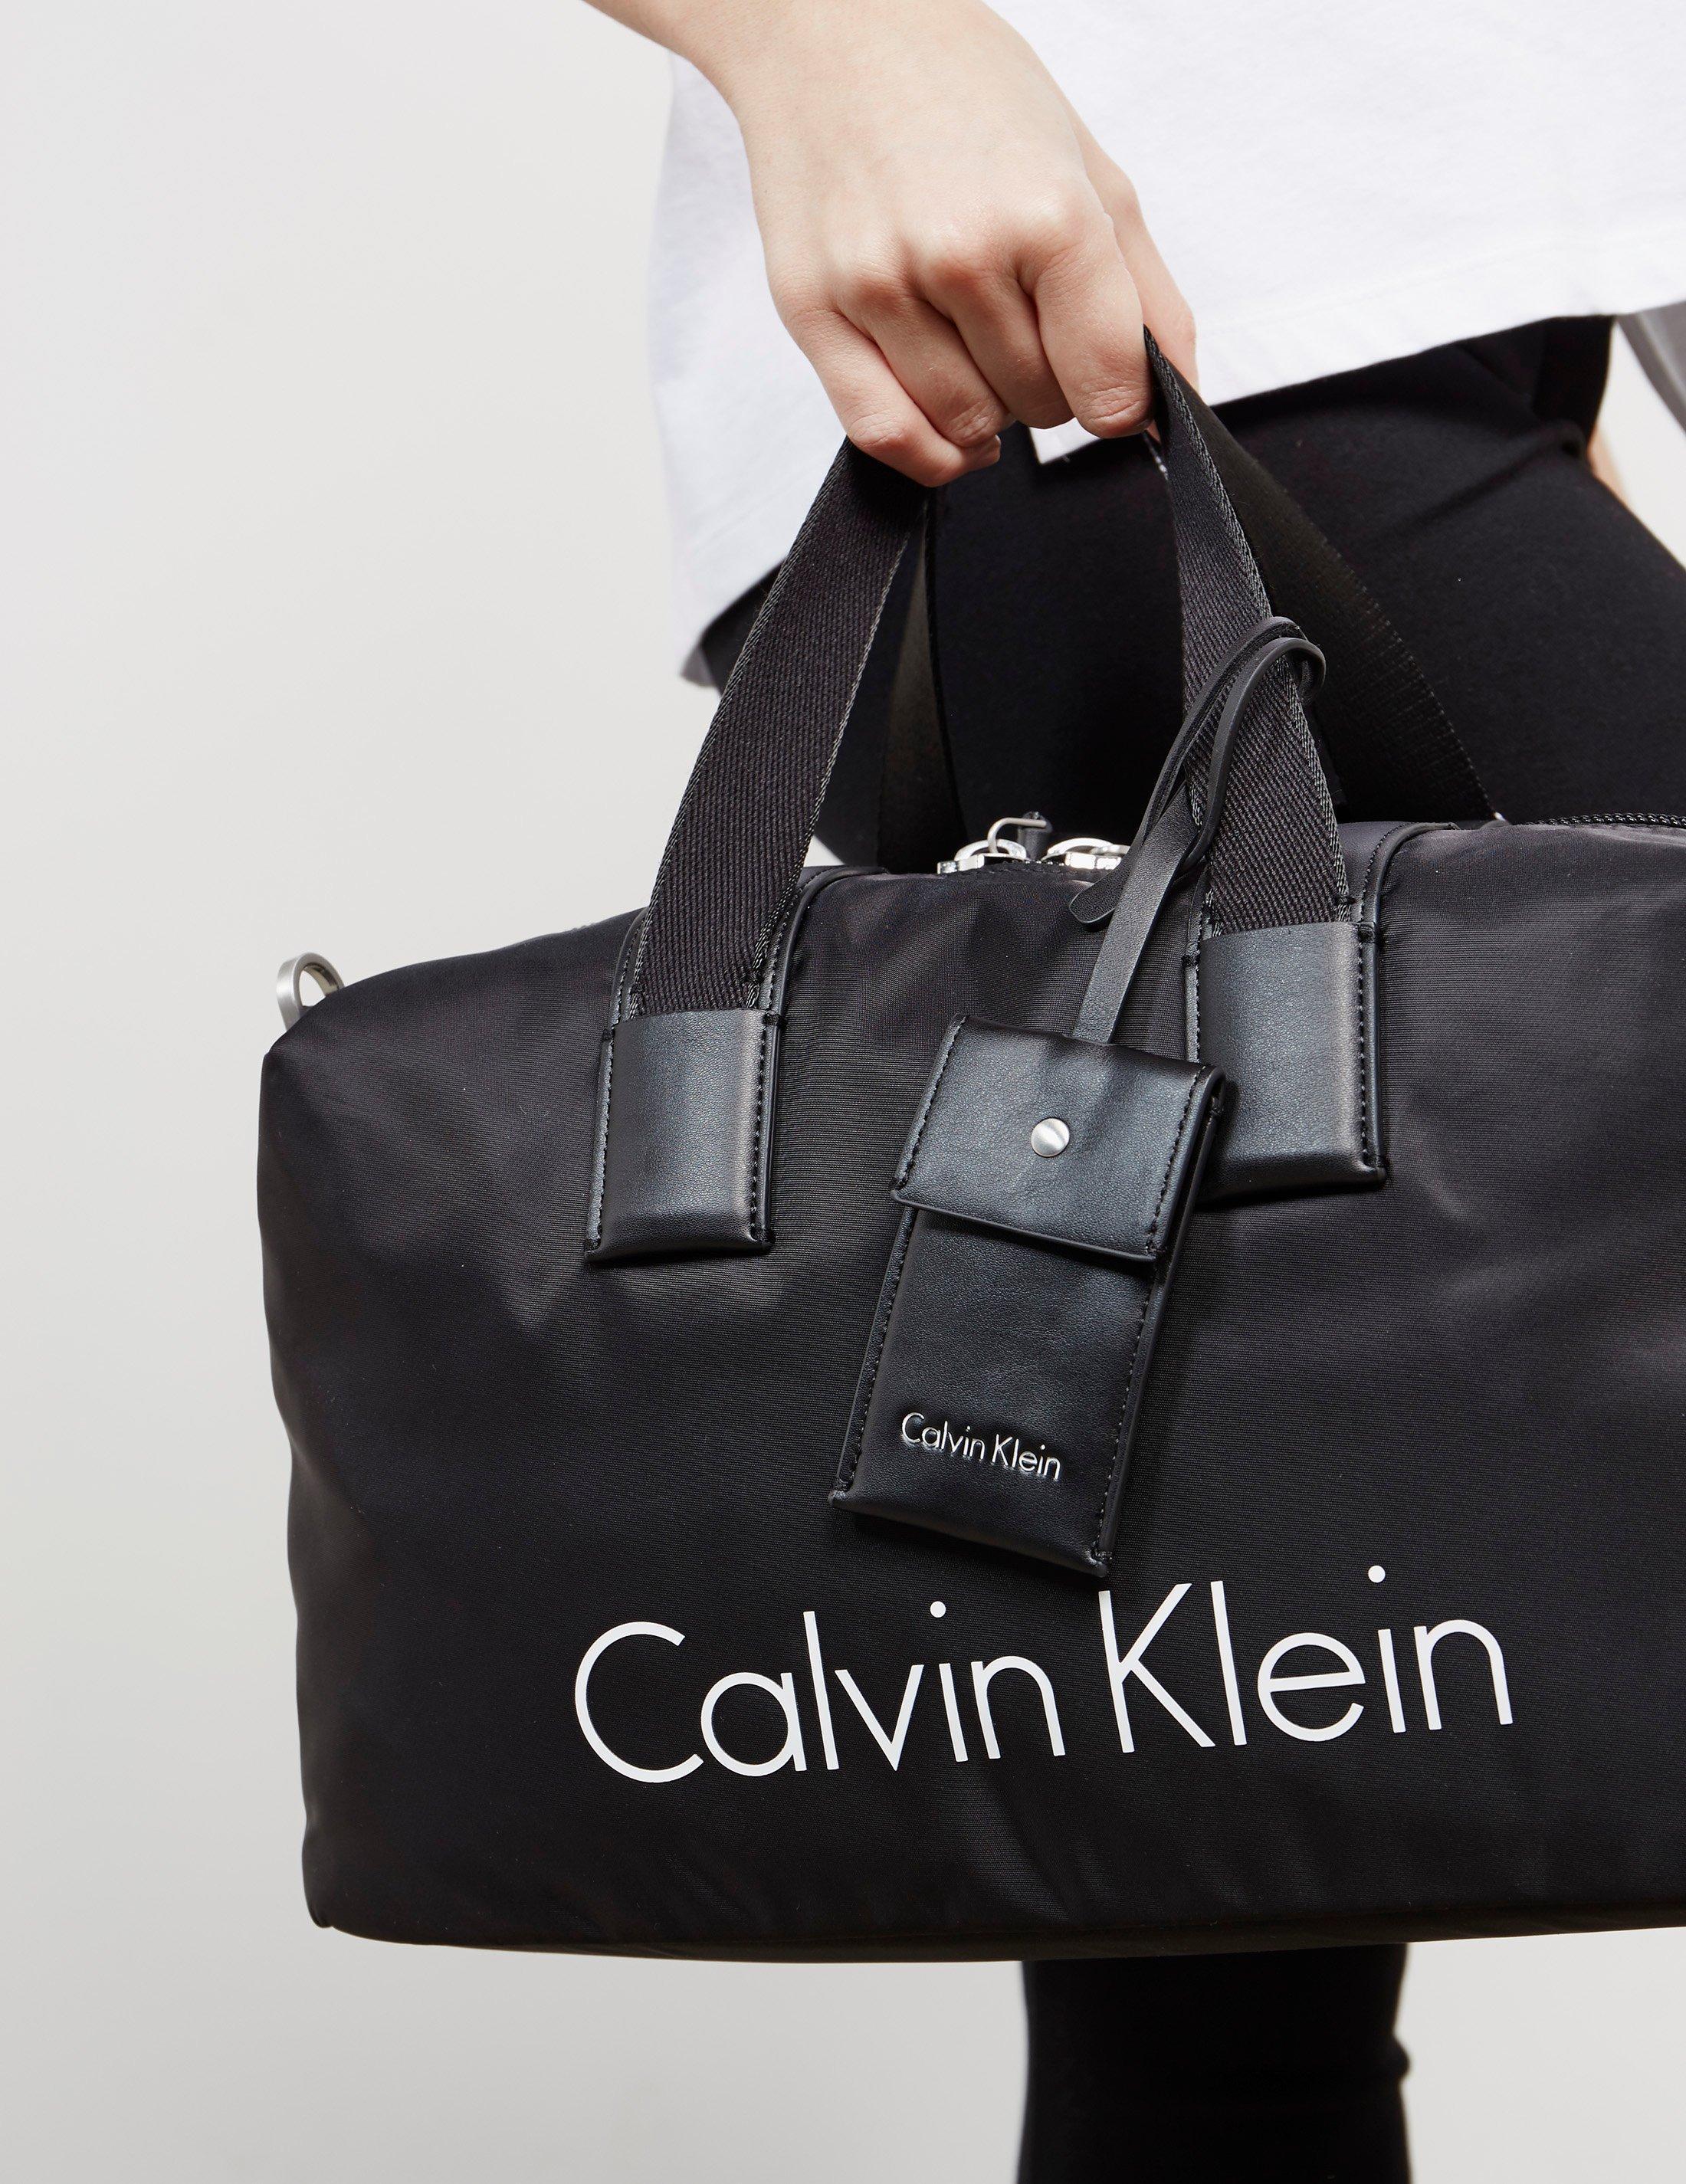 Lyst - Calvin Klein Womens Nylon Duffle Bag Black in Black 1894097910